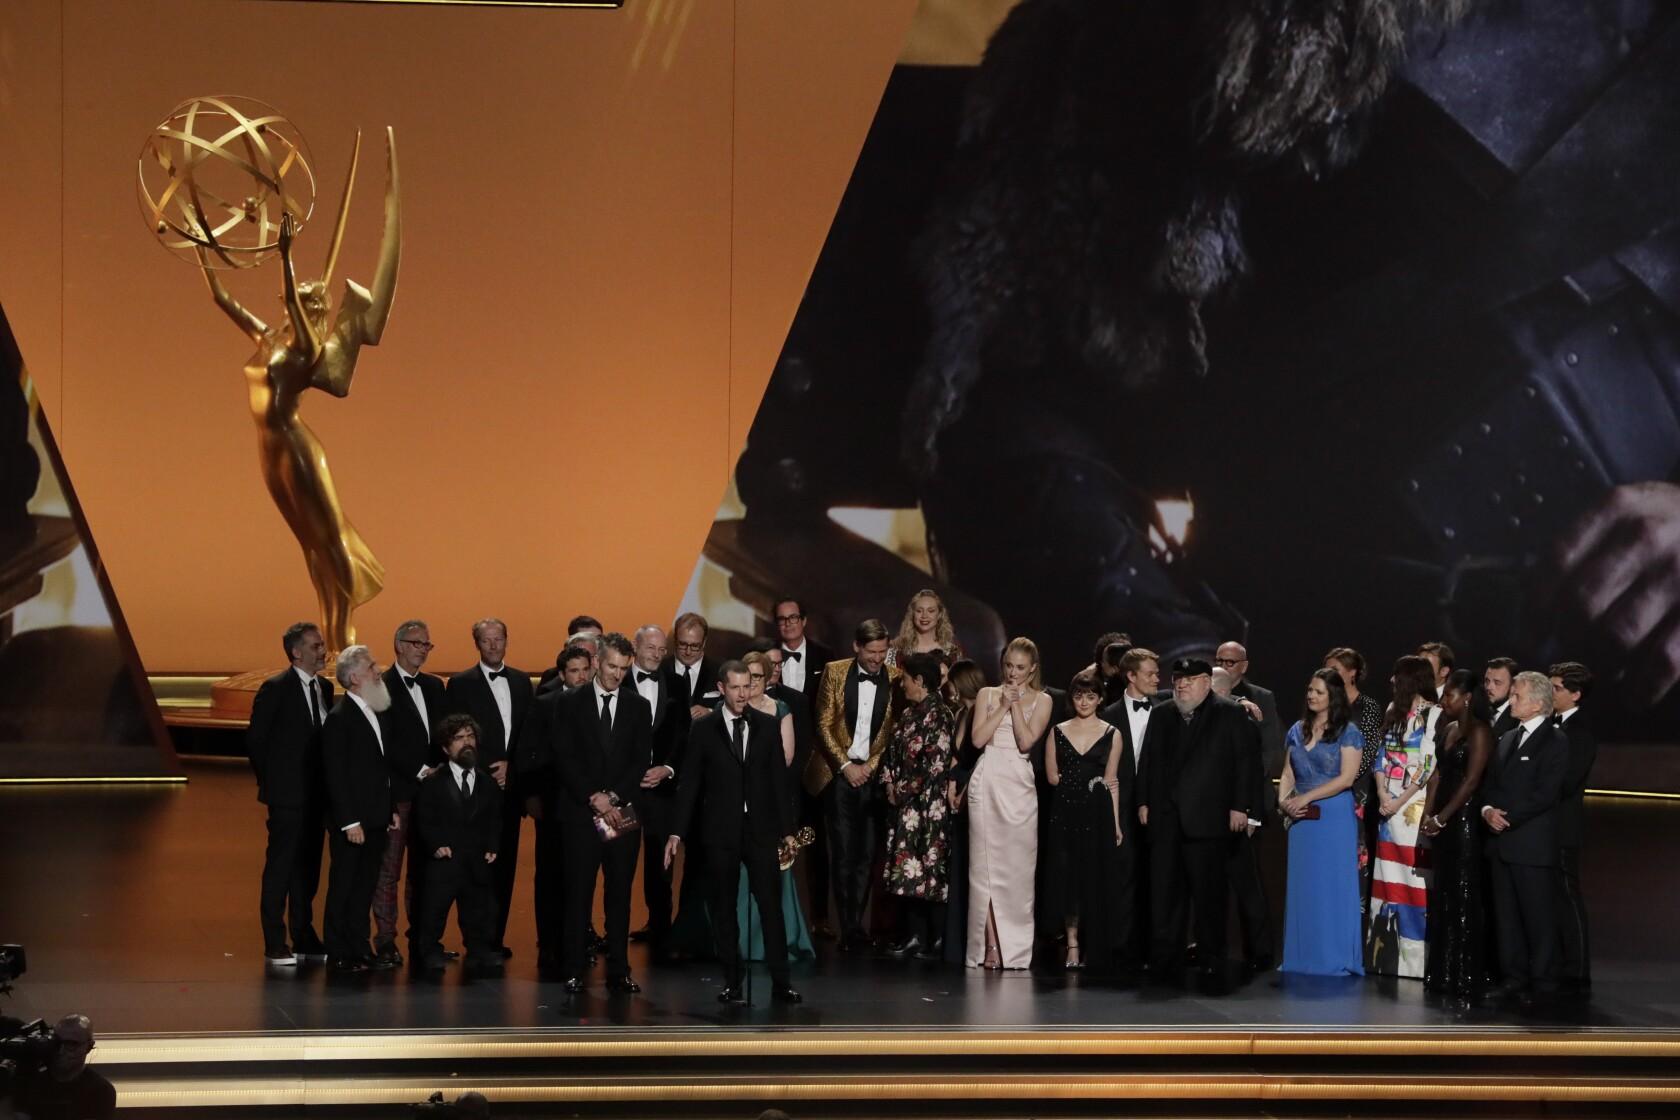 List Of Emmy Winners 2020.Emmys 2019 The Winners List Los Angeles Times